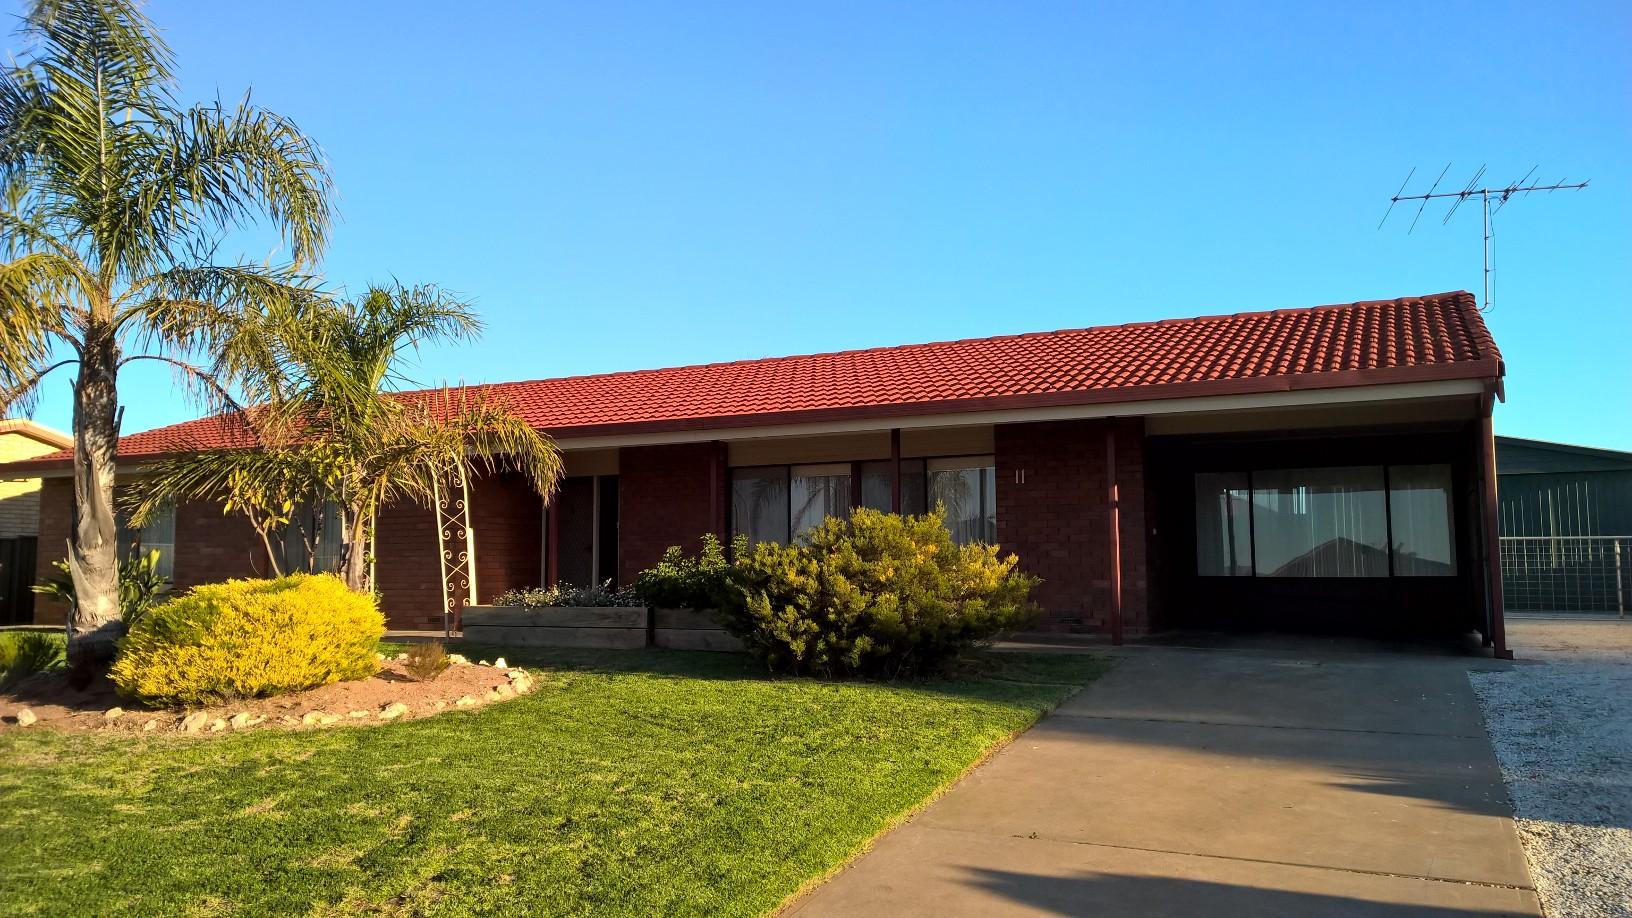 Masons Real Estate Real Estate Agency In Murray Bridge Sa 5253